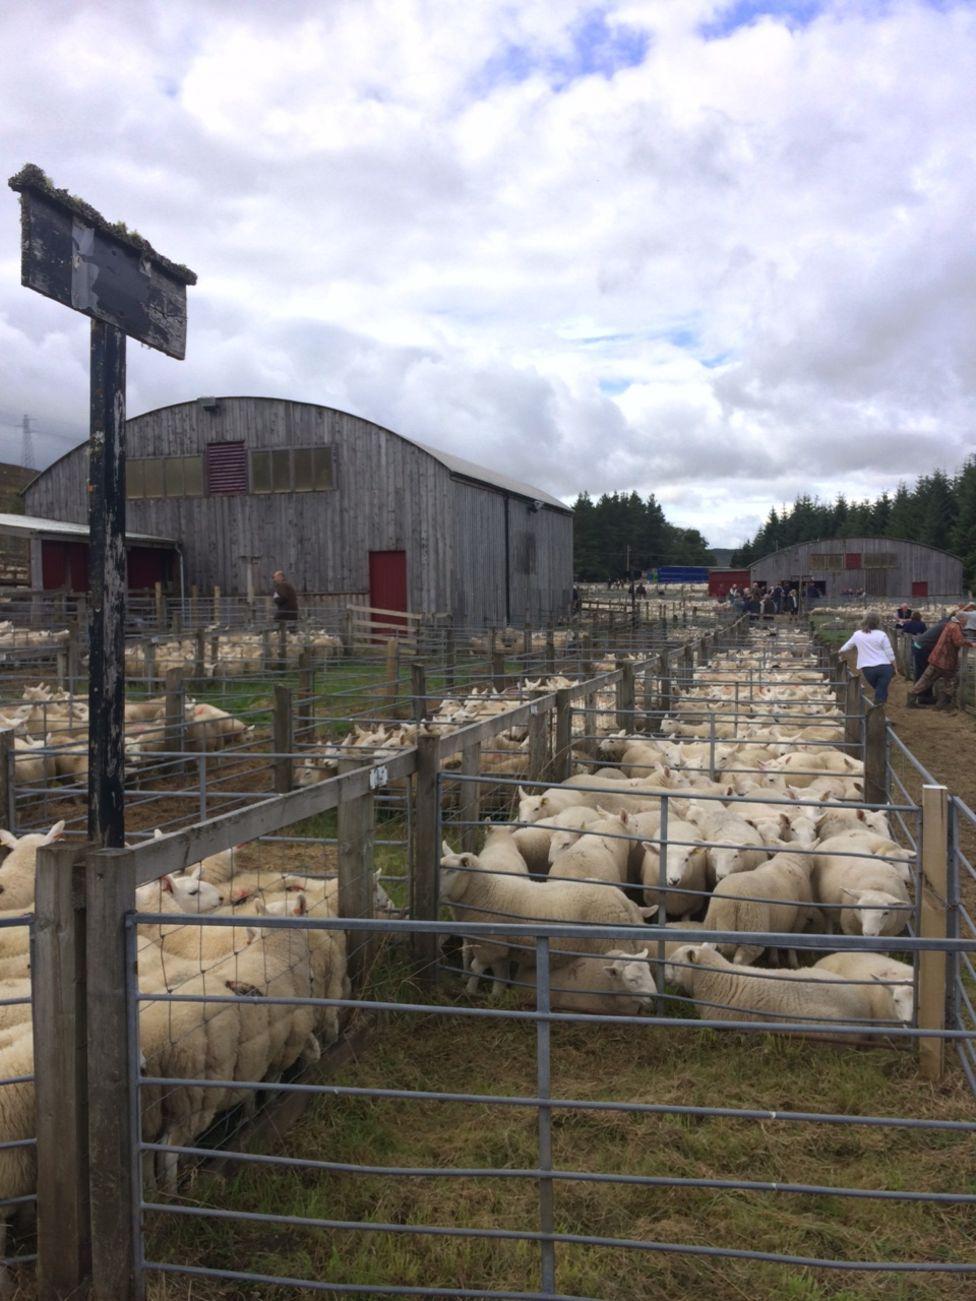 Lairg sheep sales